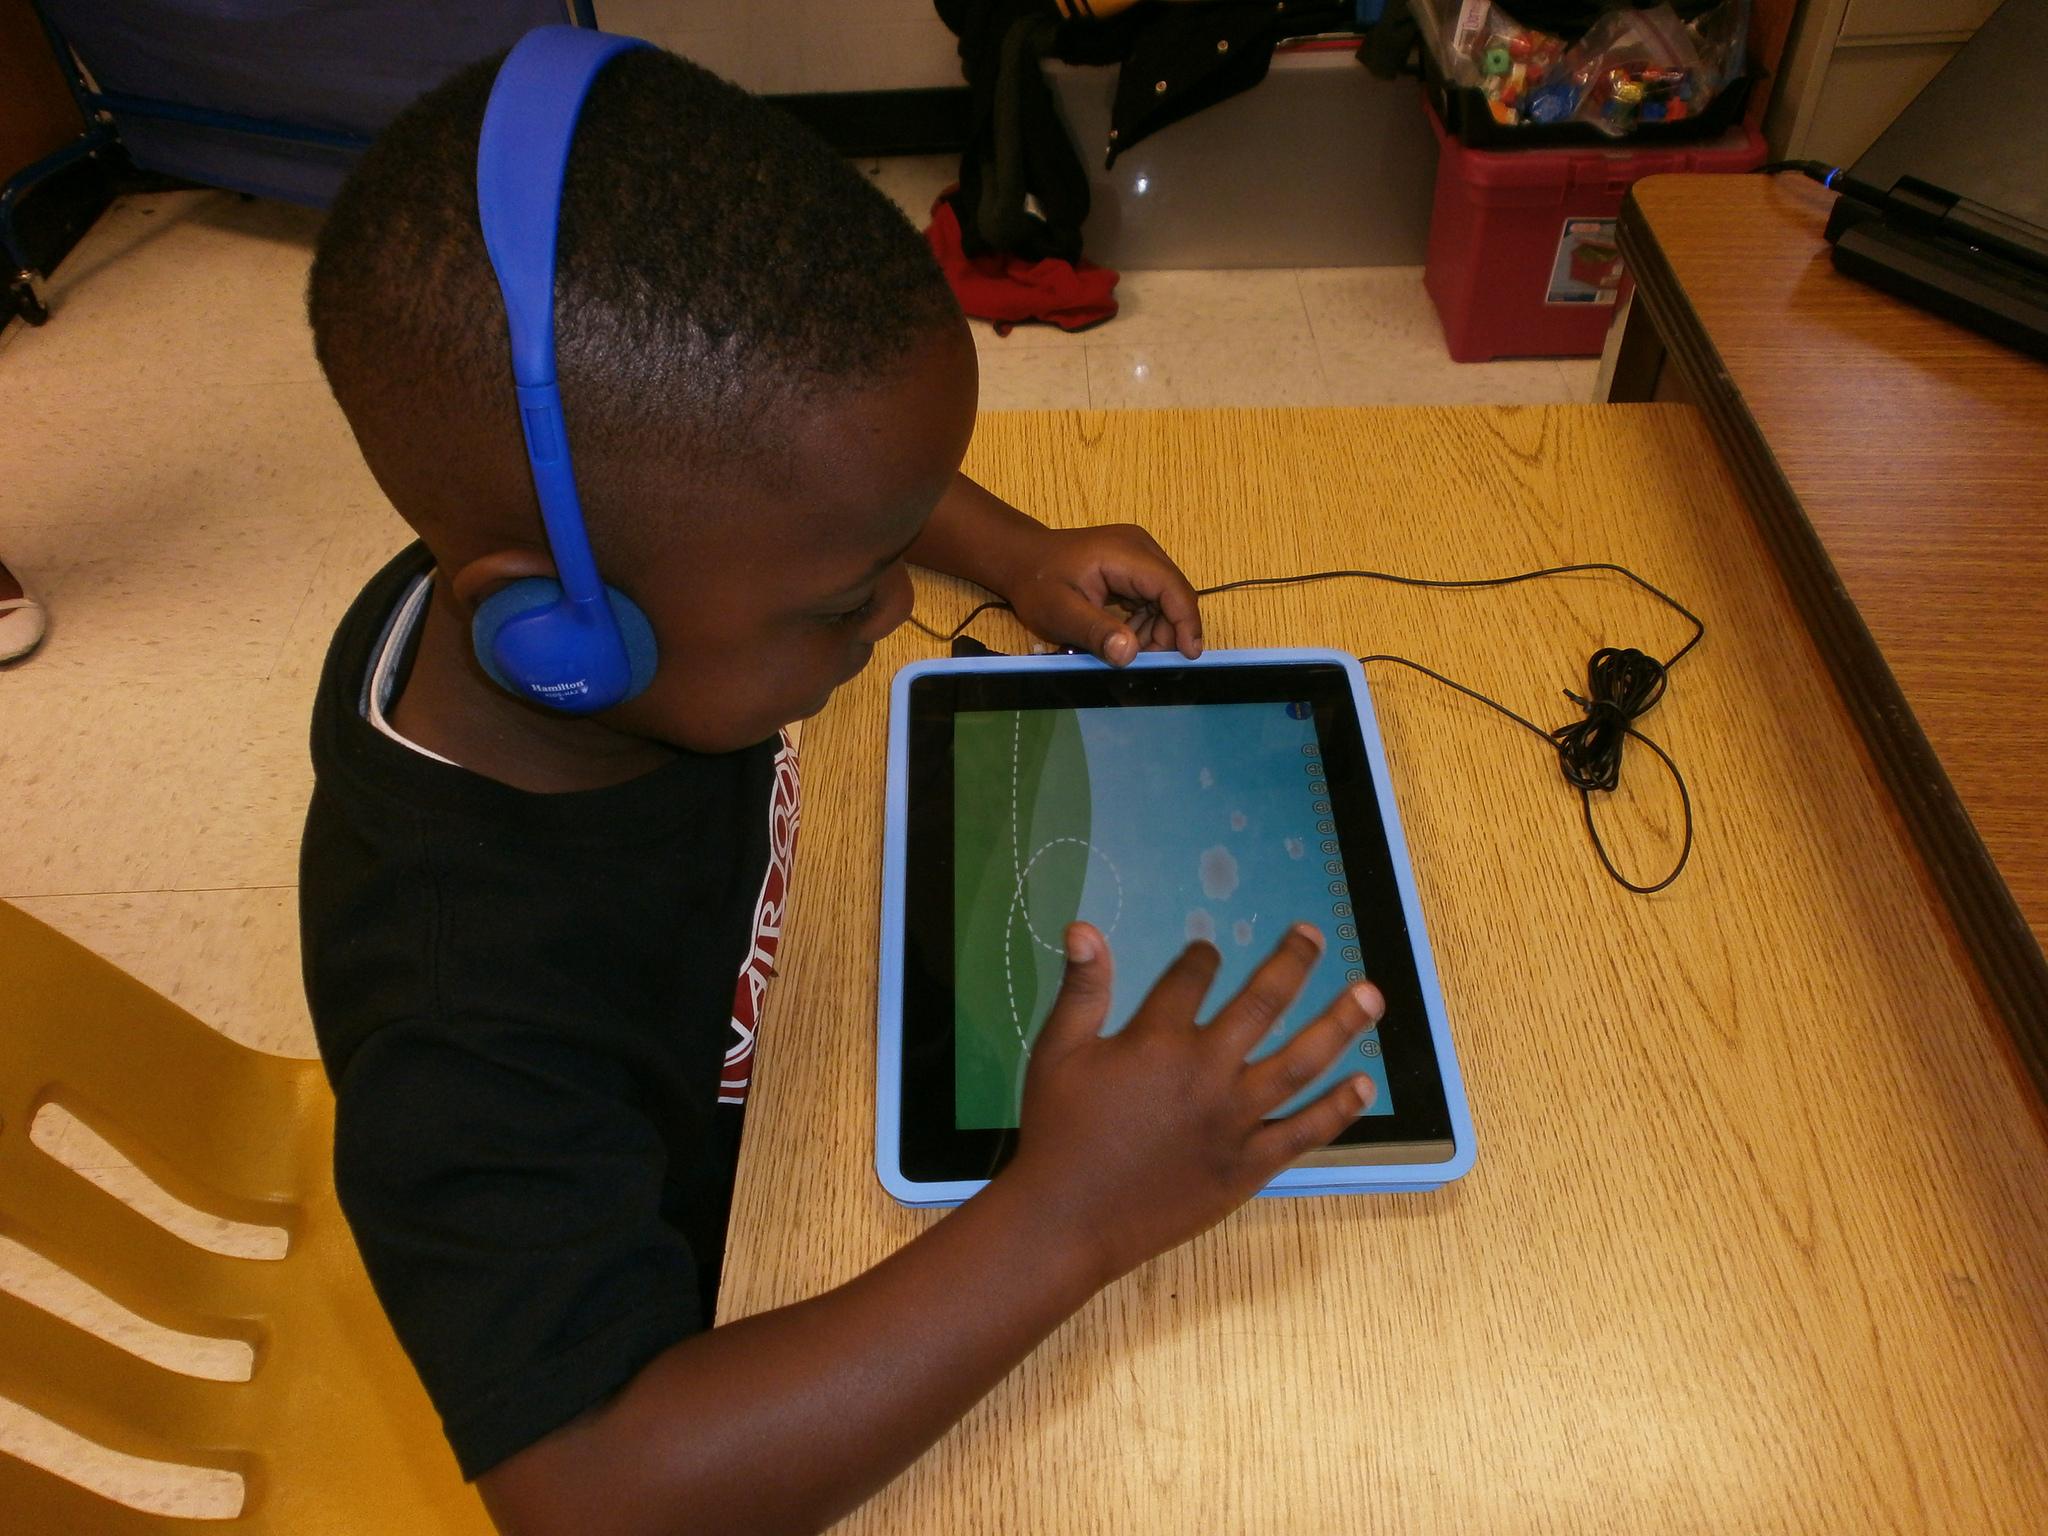 Benefits of Using iPads- kids